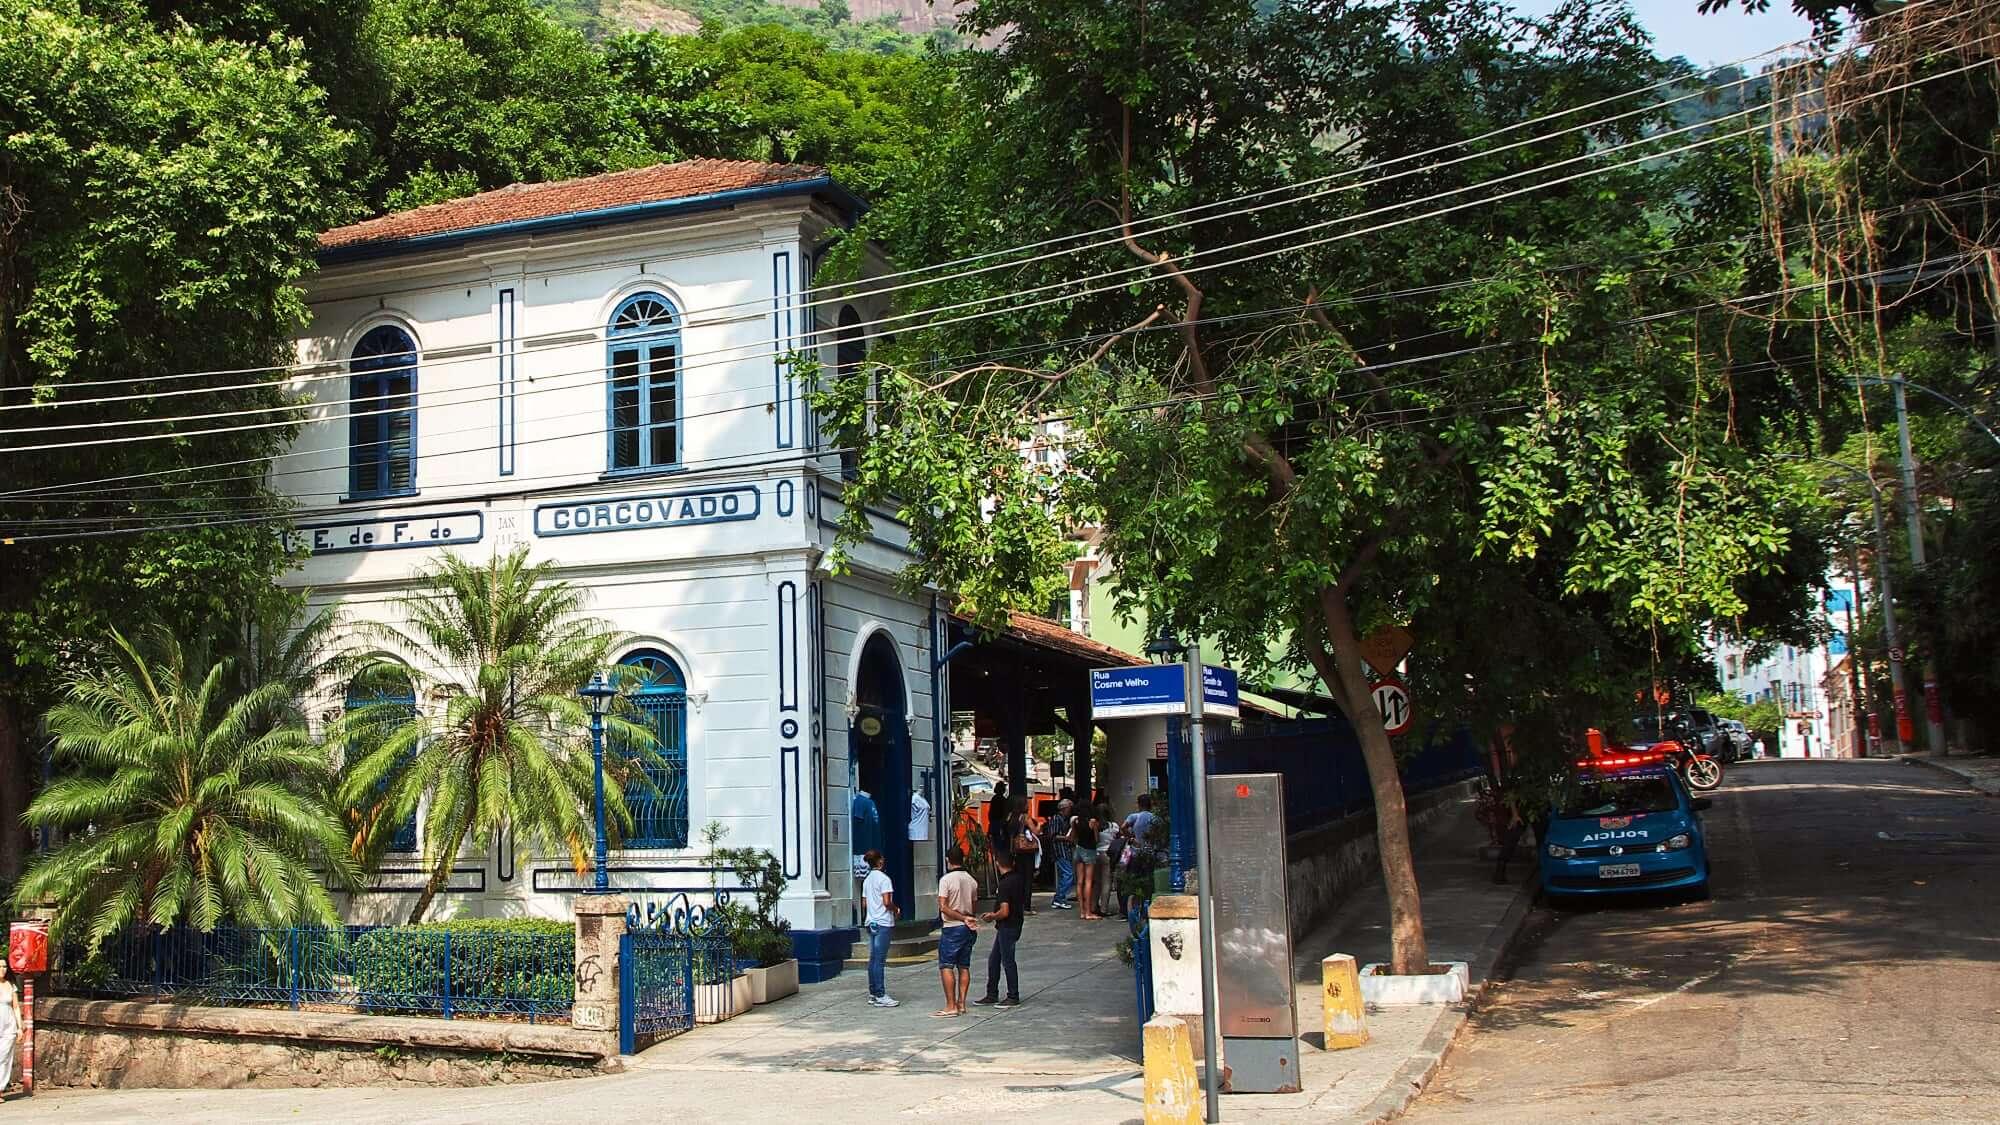 Cosme Velho Railway Station Terminus Corcovado Train